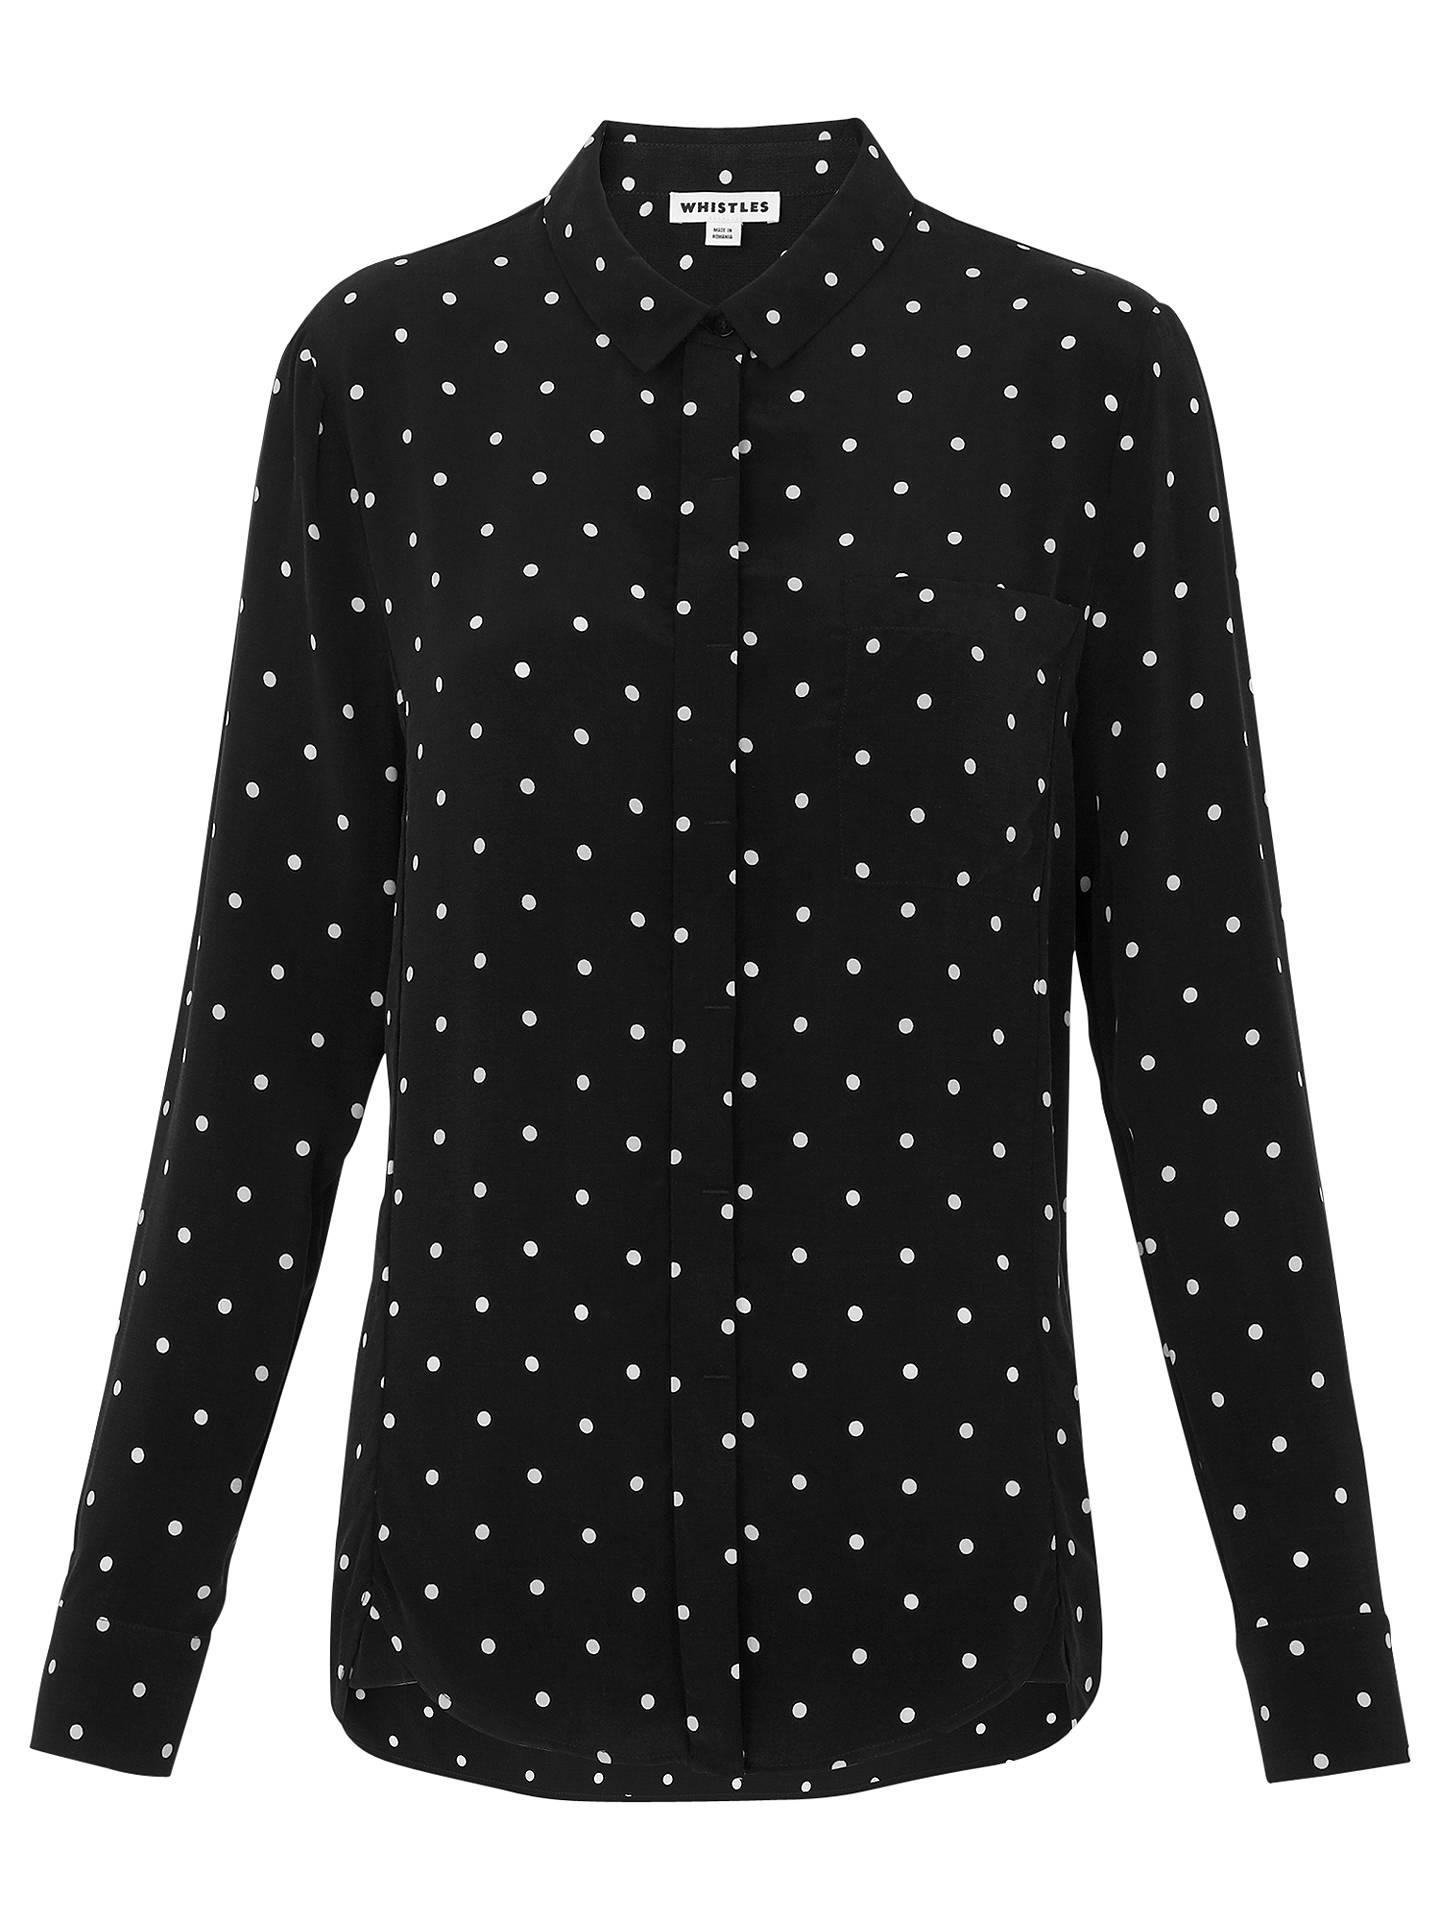 89de483ea7f48a Buy Whistles Emelia Spot Shirt, Black/White, 6 Online at johnlewis.com ...